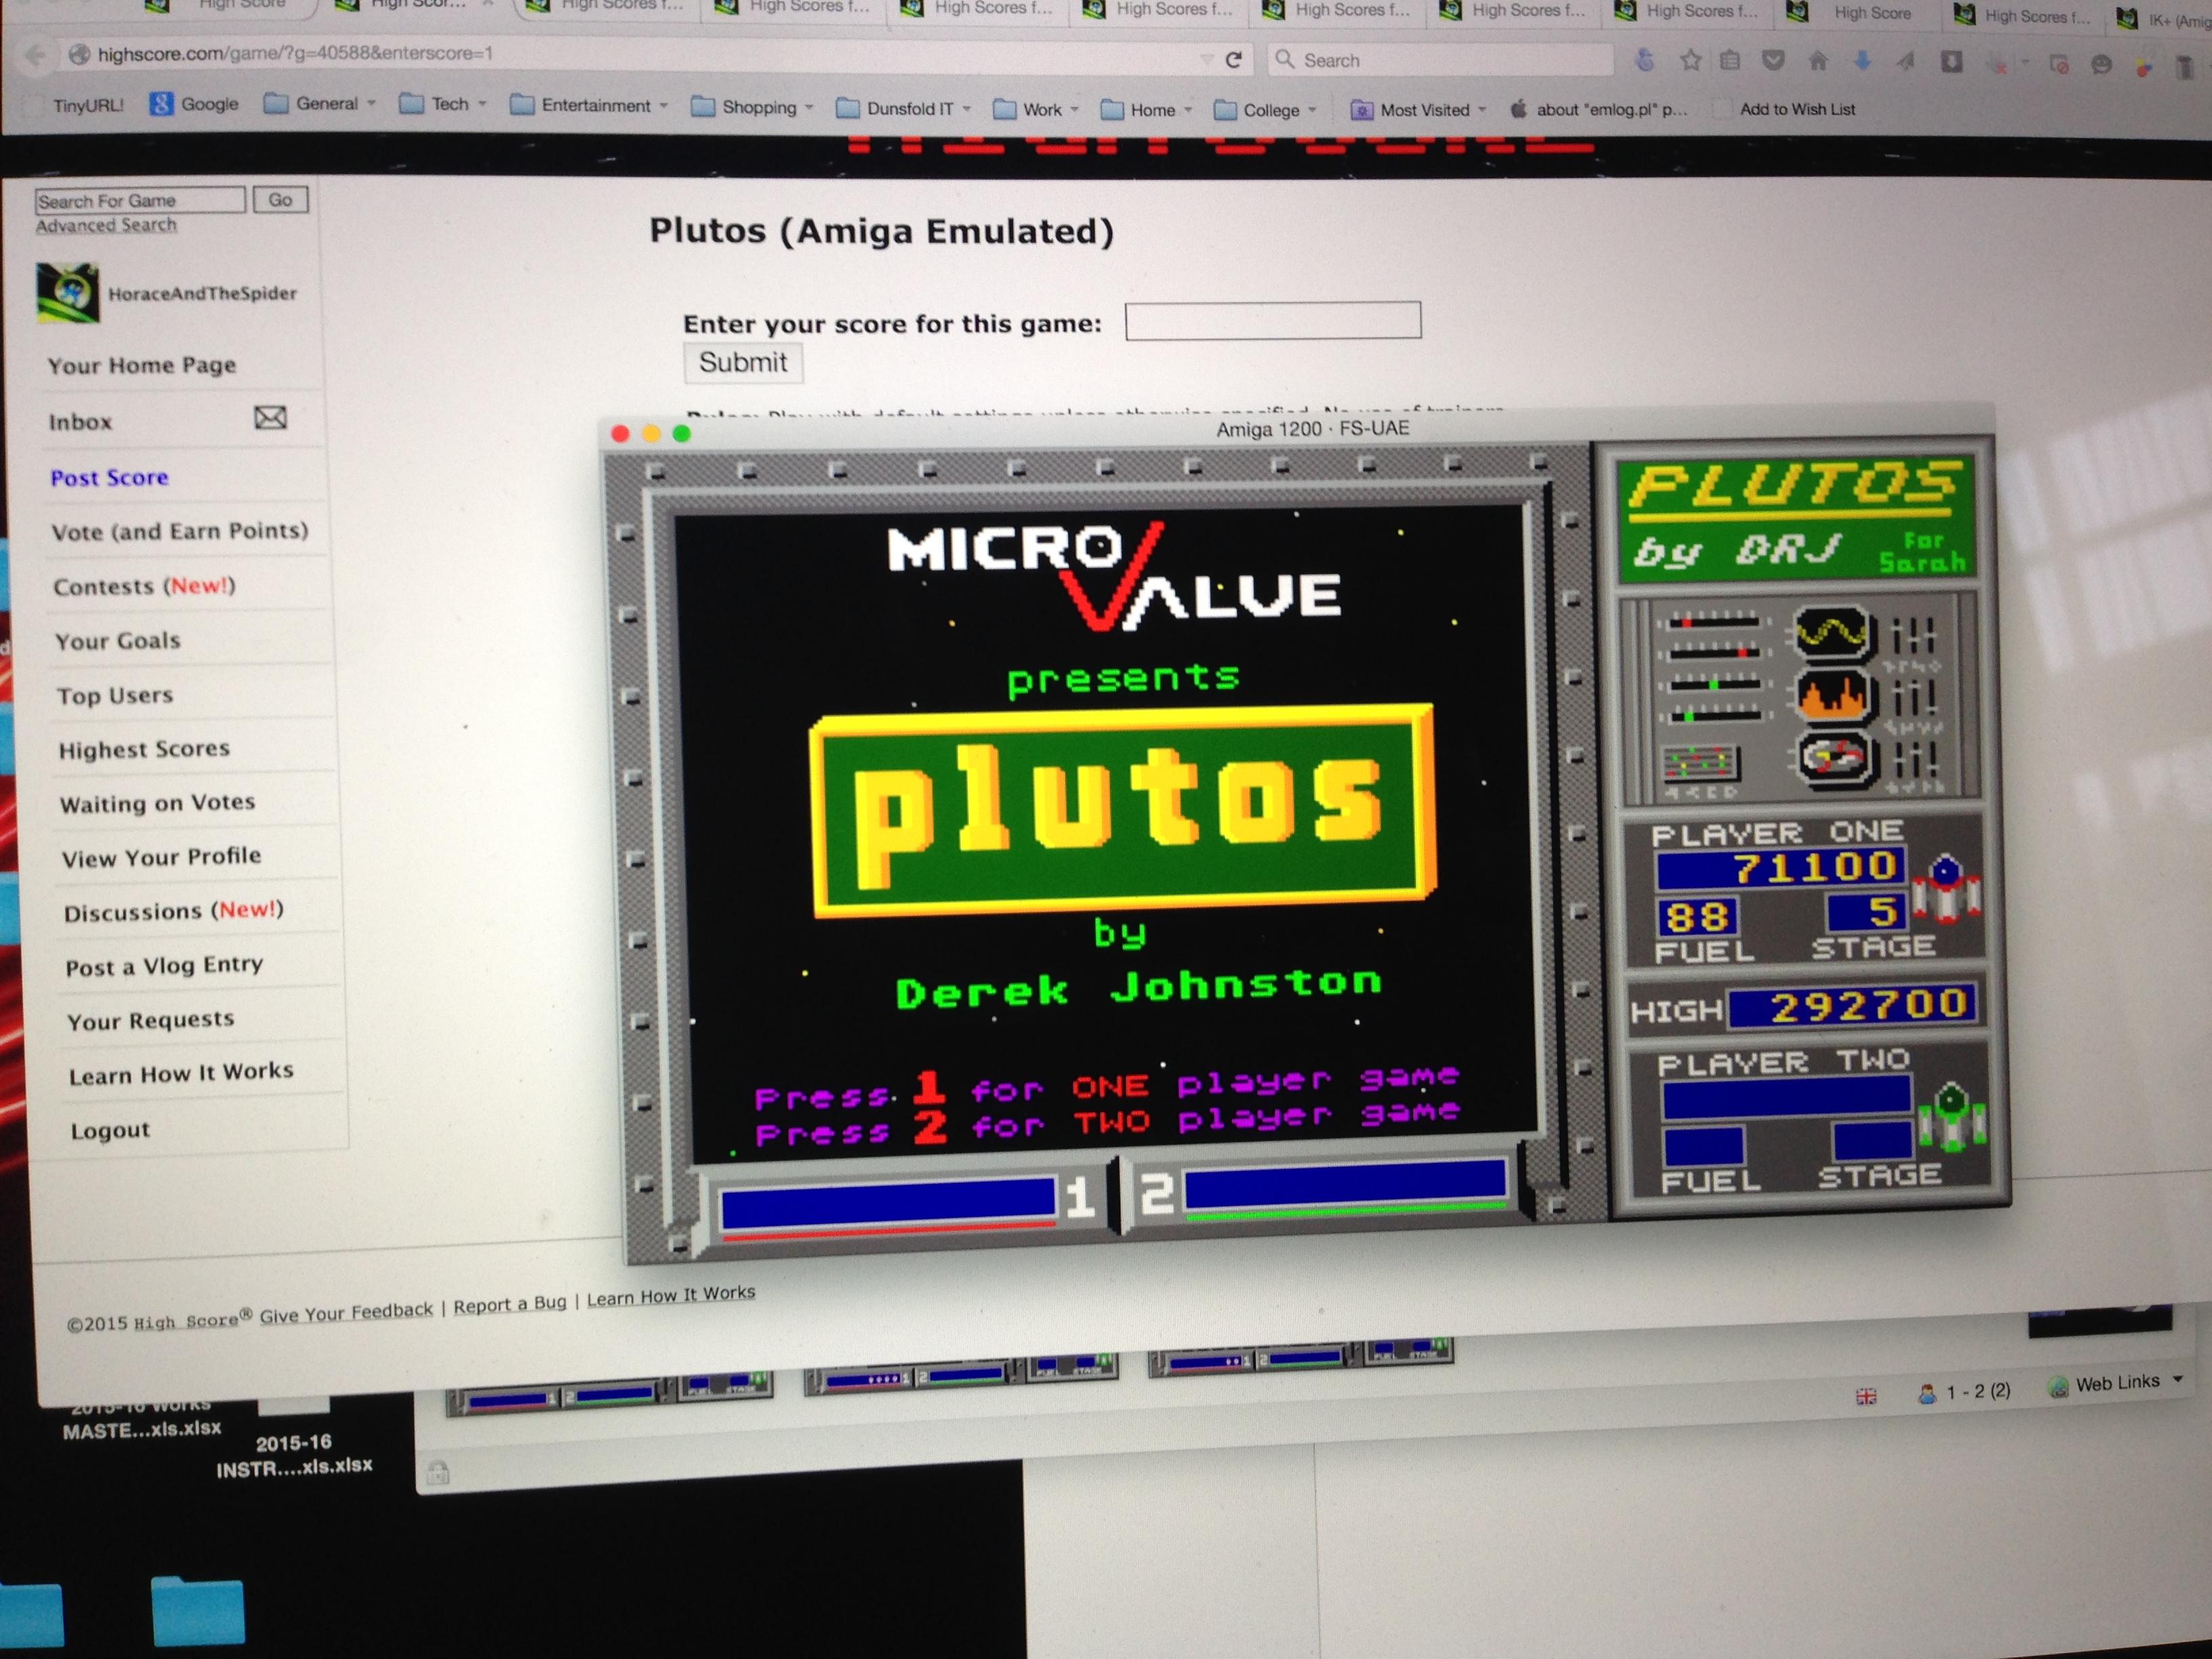 Plutos 71,100 points